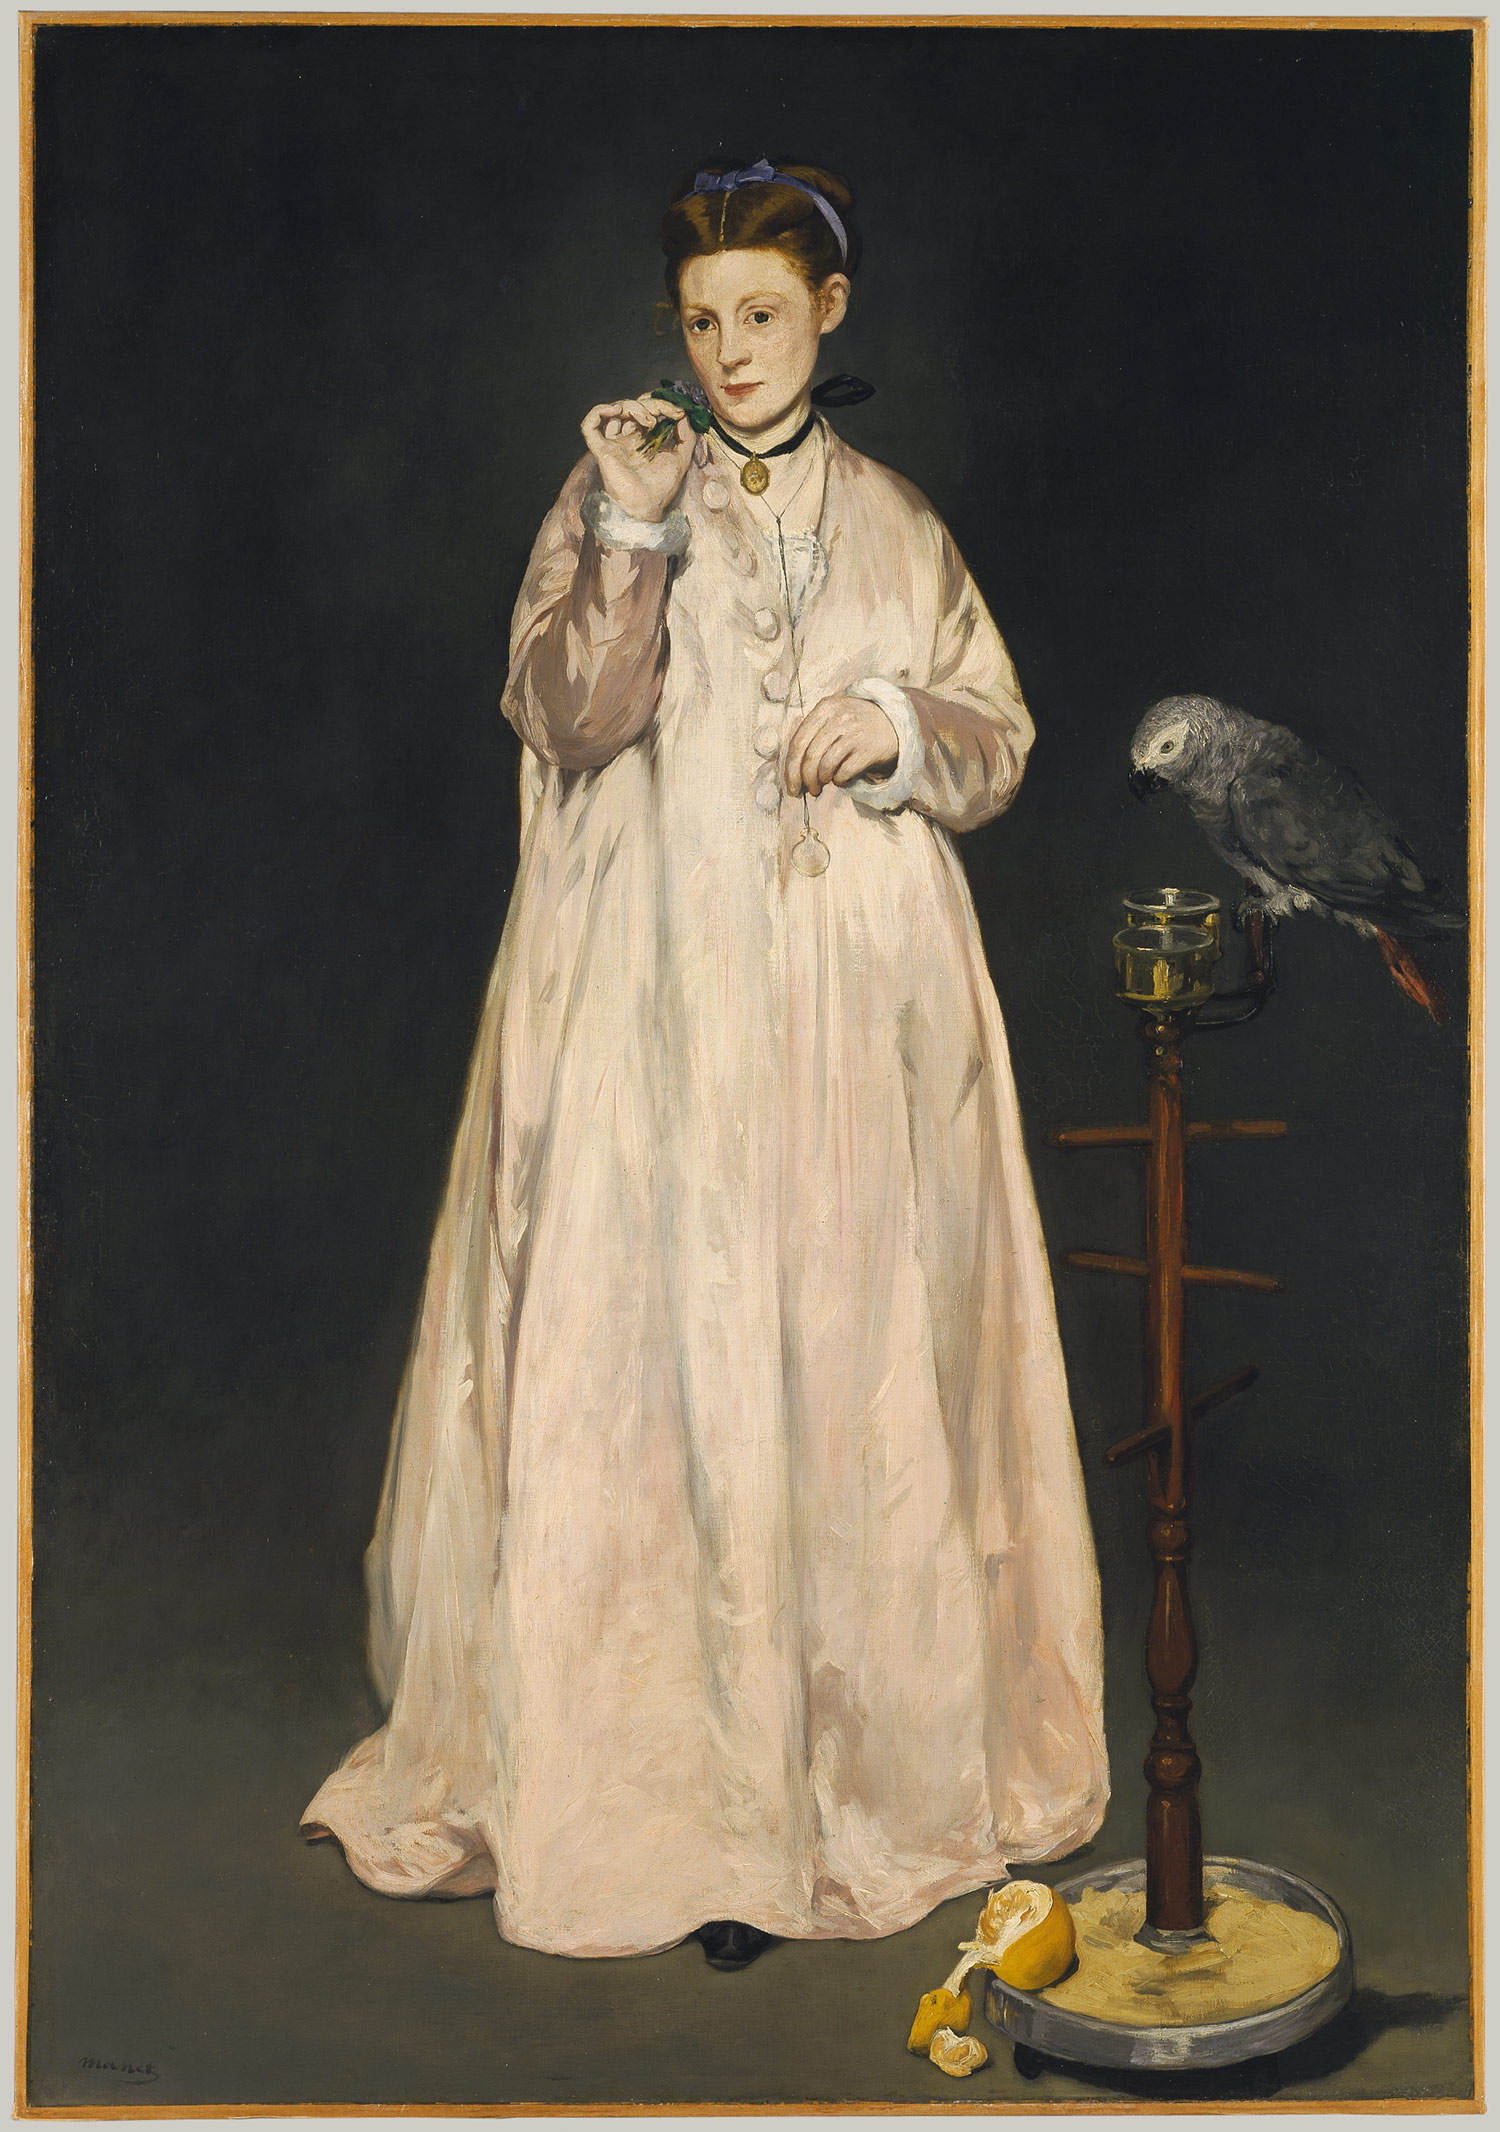 Edouard Manet, Woman with a Parrot, 1866, Metropolitan Museum of Art